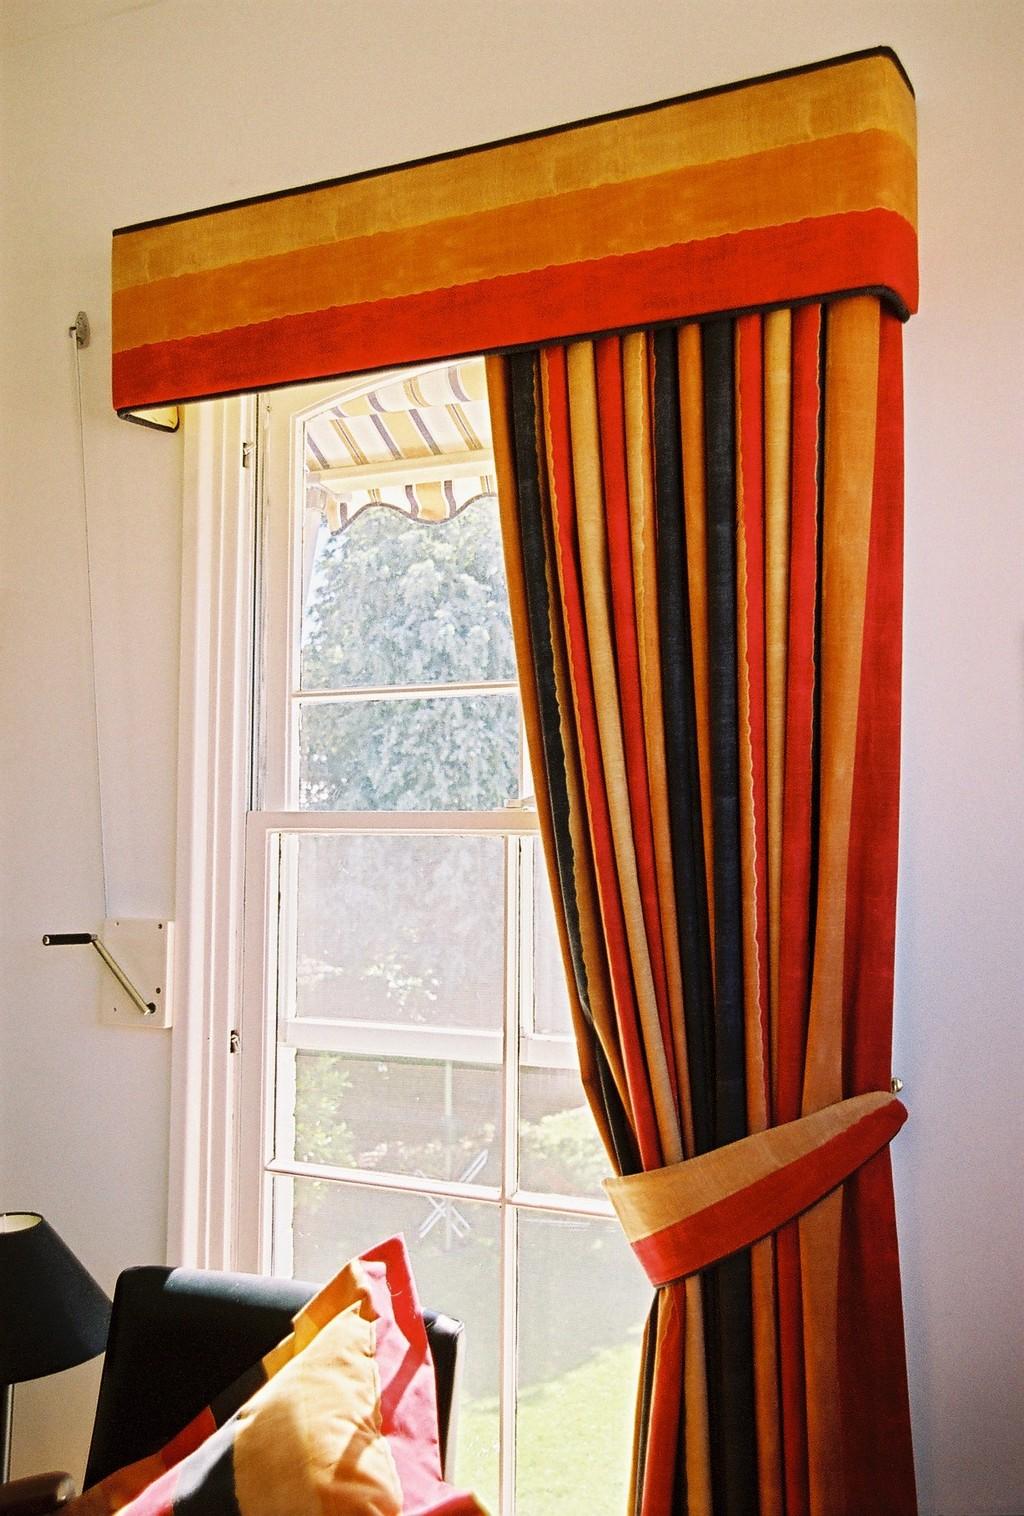 fruit kitchen curtains hotels with kitchens in portland oregon curtain holdbacks decorlinen com retro circles window extra long shower chinz